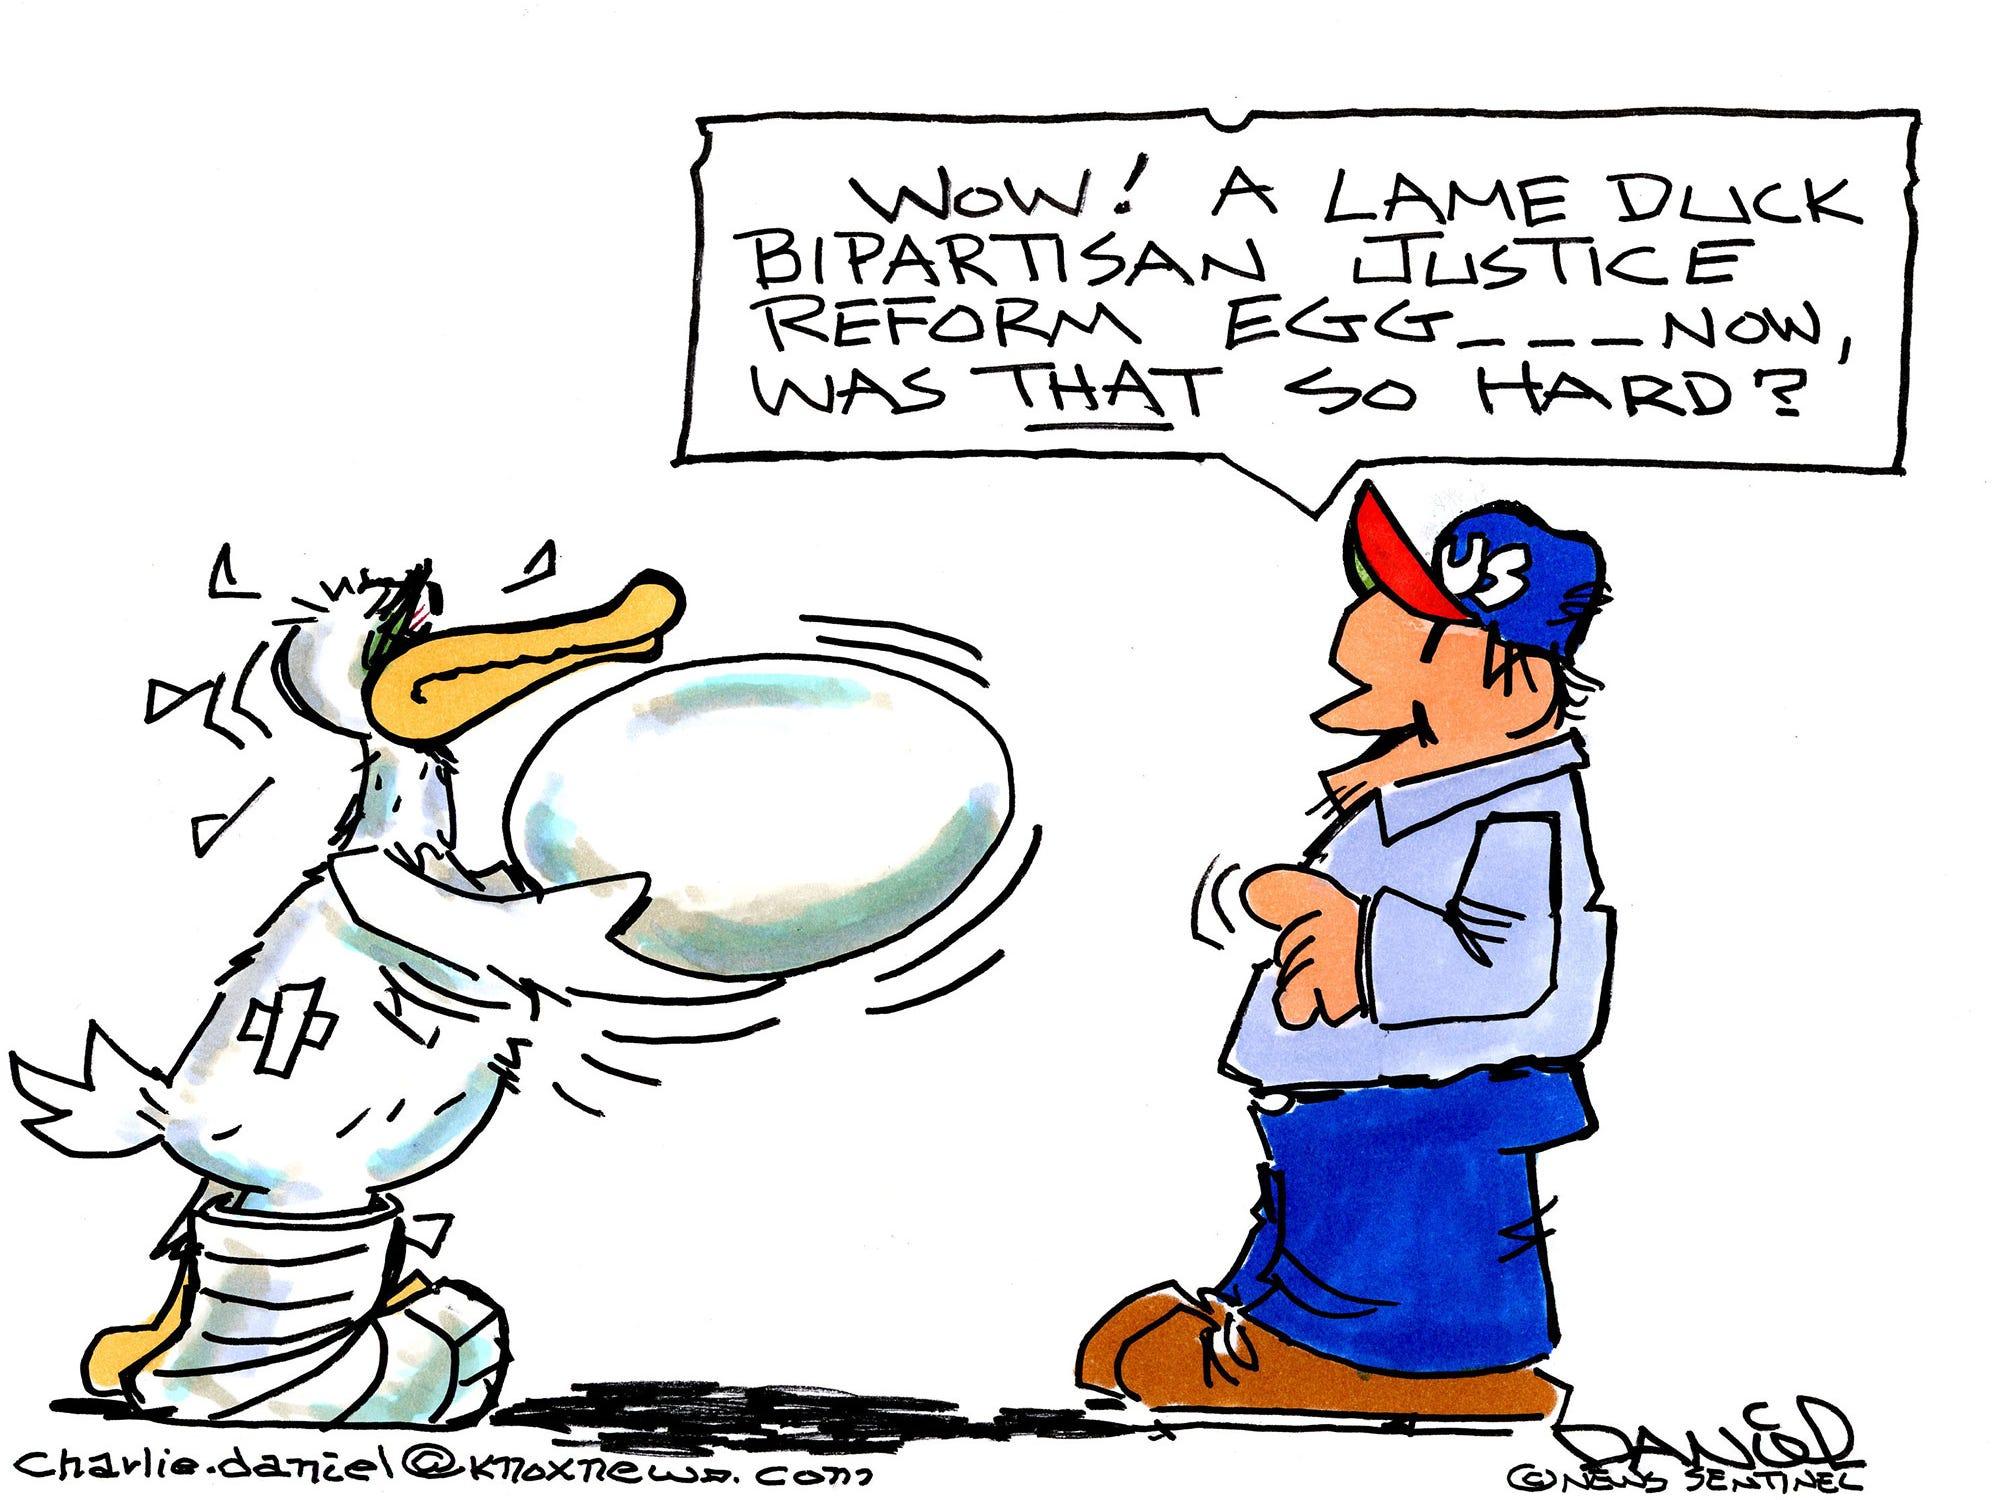 Charlie Daniel editorial cartoon for Dec. 20, 2018.